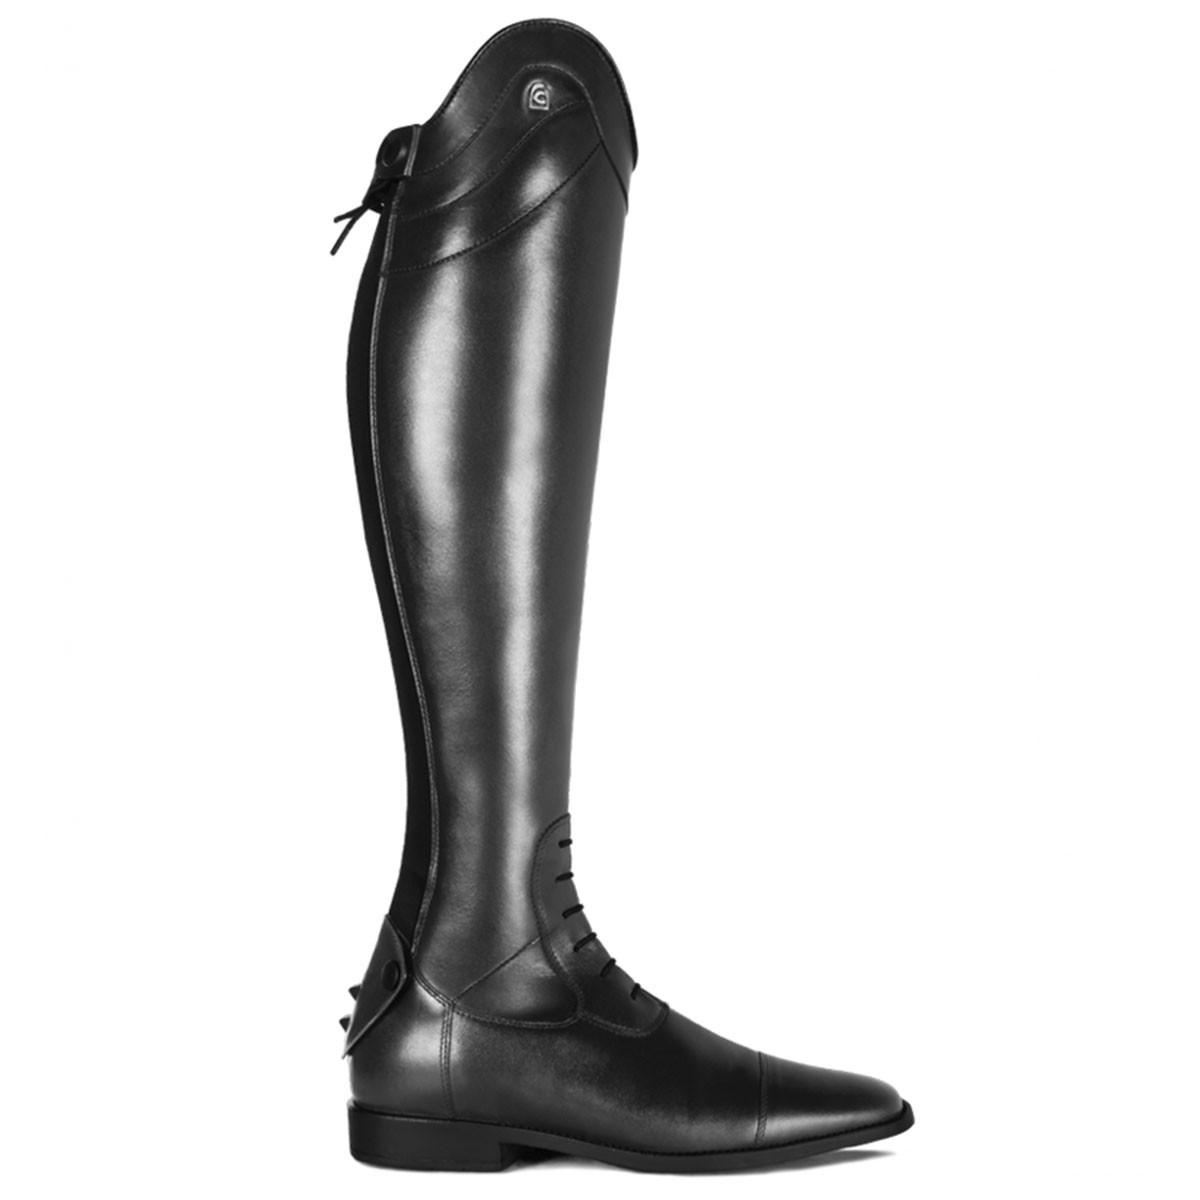 Cavallo Linus Slim rijlaars zwart maat:5-5.5 / h46-w32